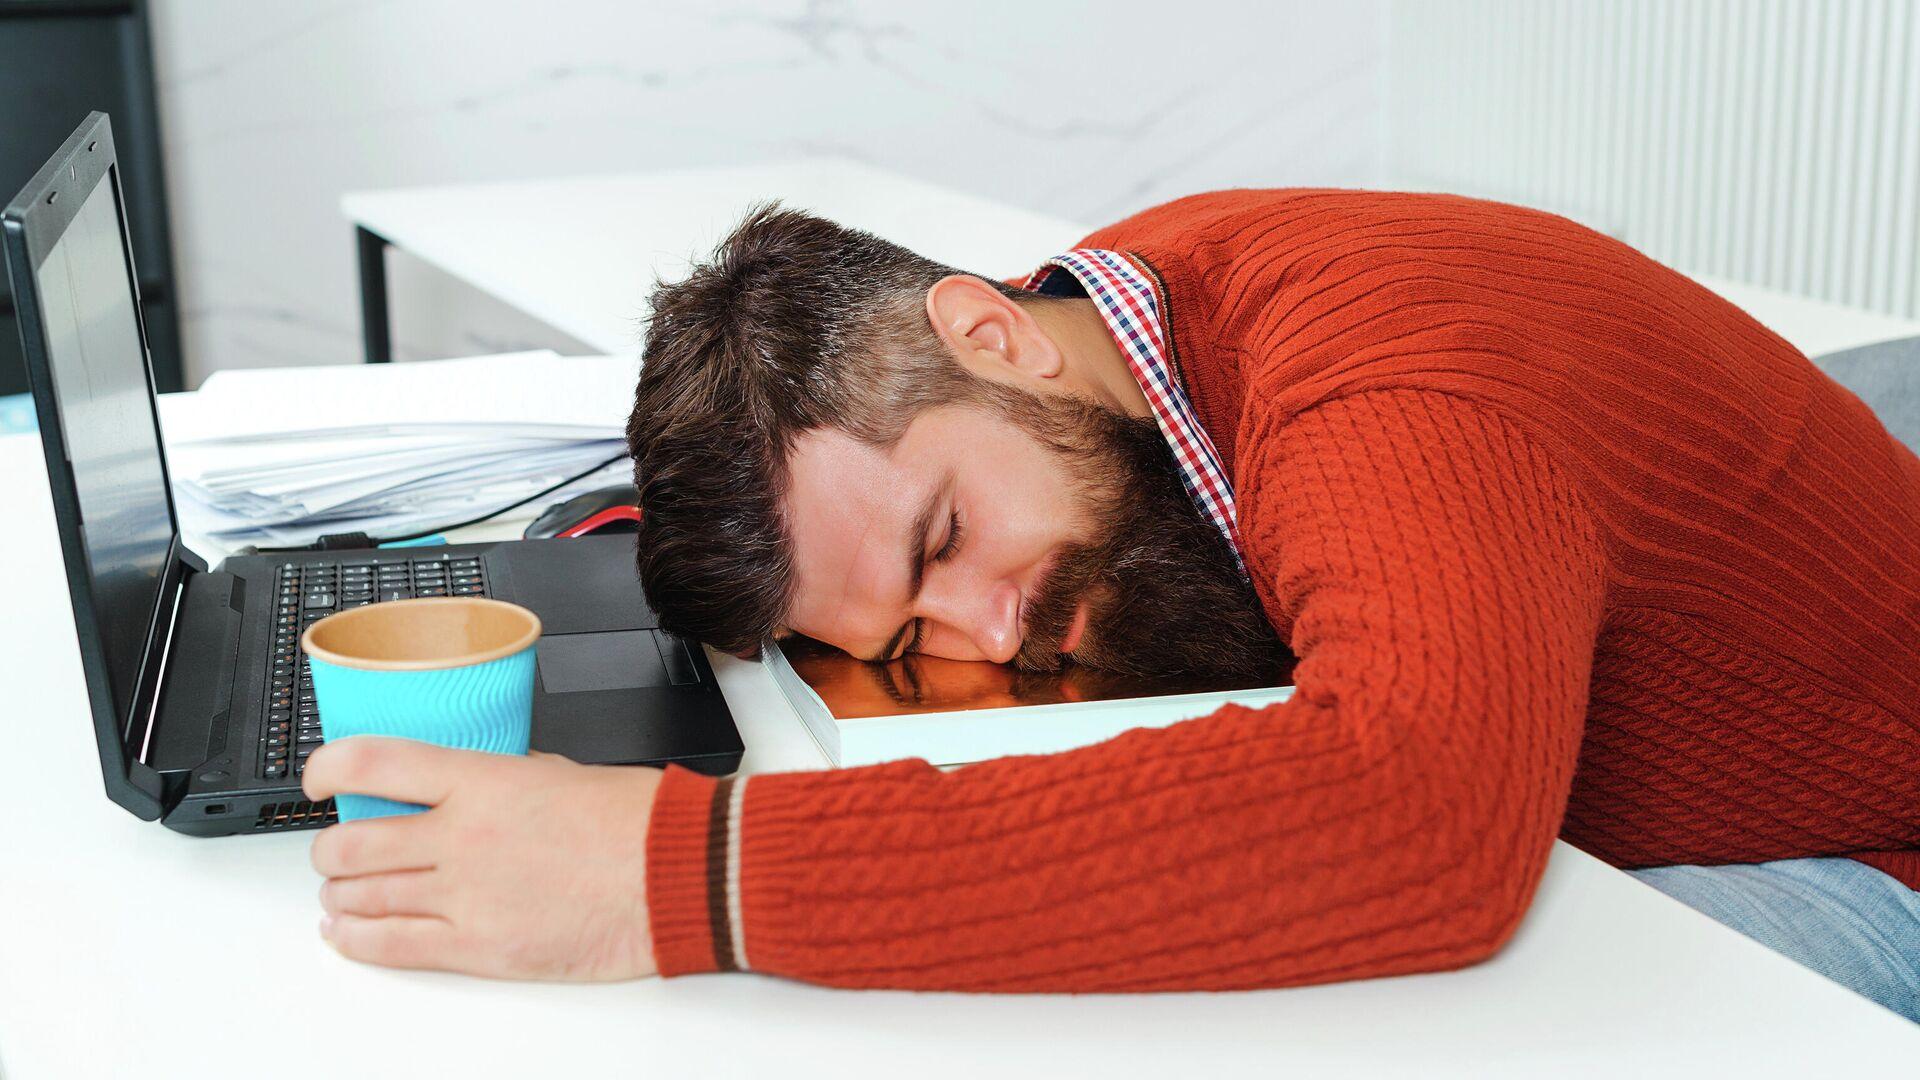 Уставший бизнесмен спит в офисе - РИА Новости, 1920, 04.04.2021